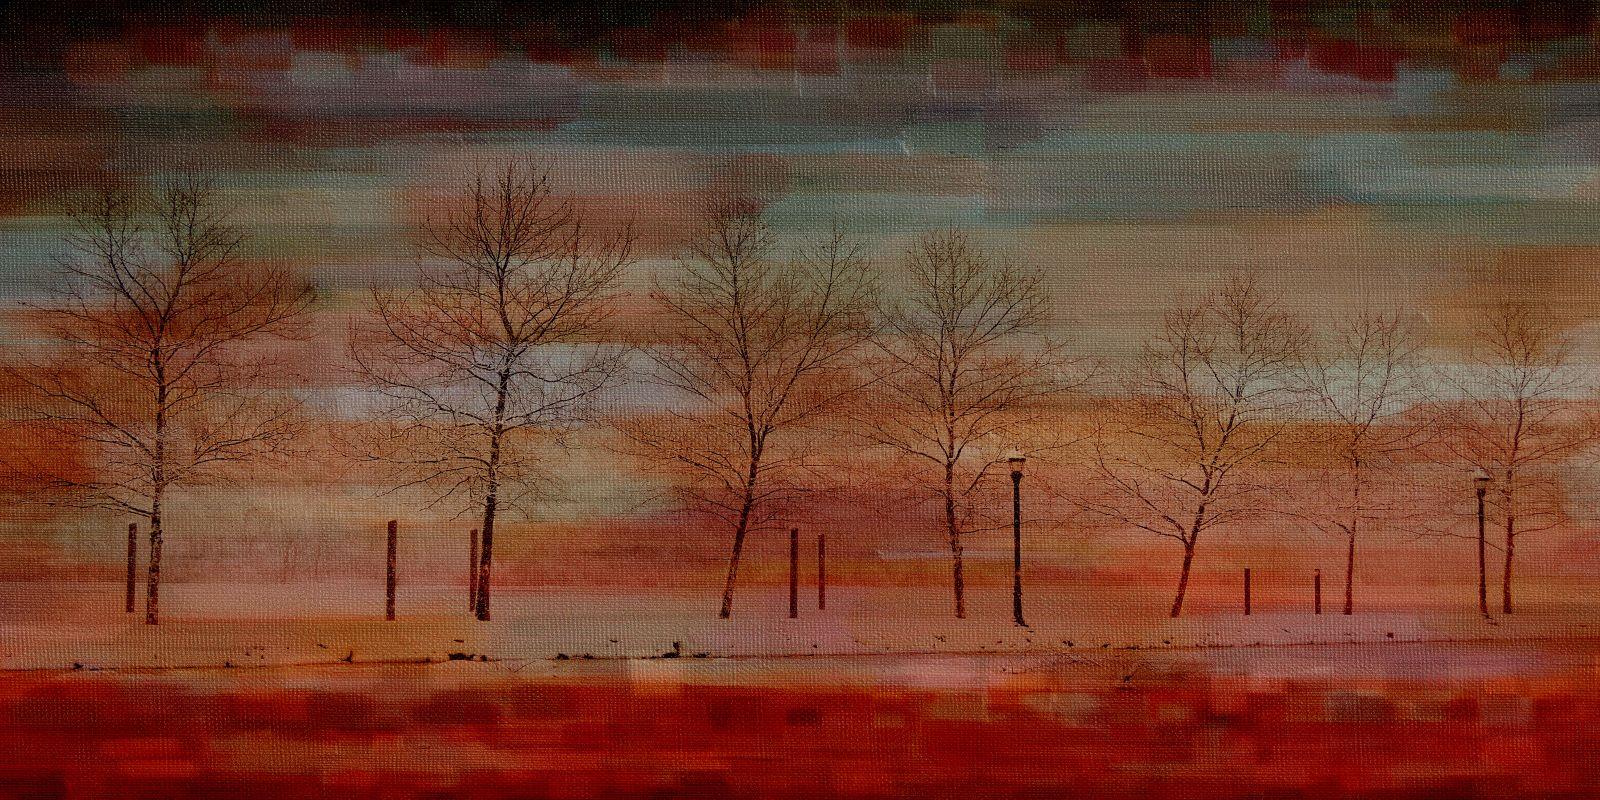 Parvez Taj Deep Red View Art Print on Premium Canvas 22 1/2 x 45 Home